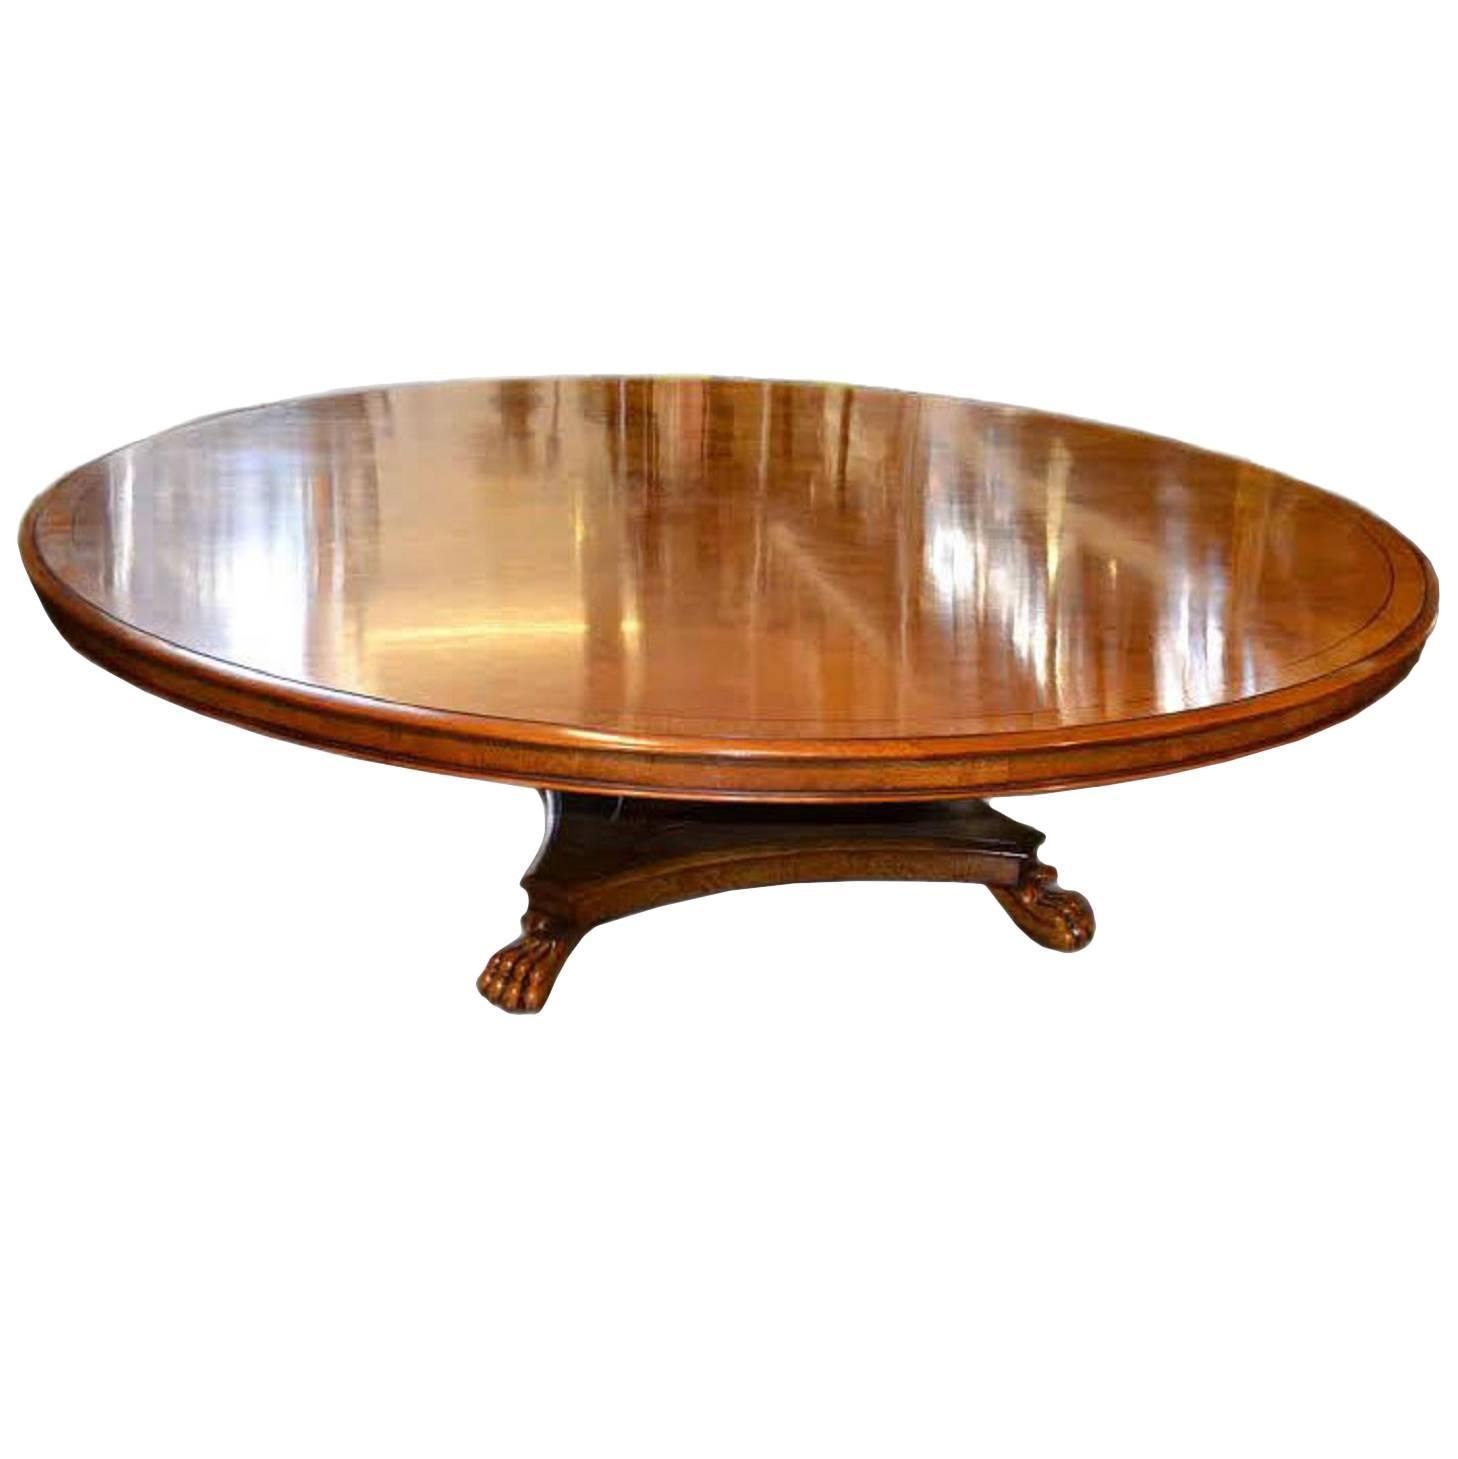 Round Oak Table : Vintage Regency Round Pollard Oak Dining Table For Sale at 1stdibs